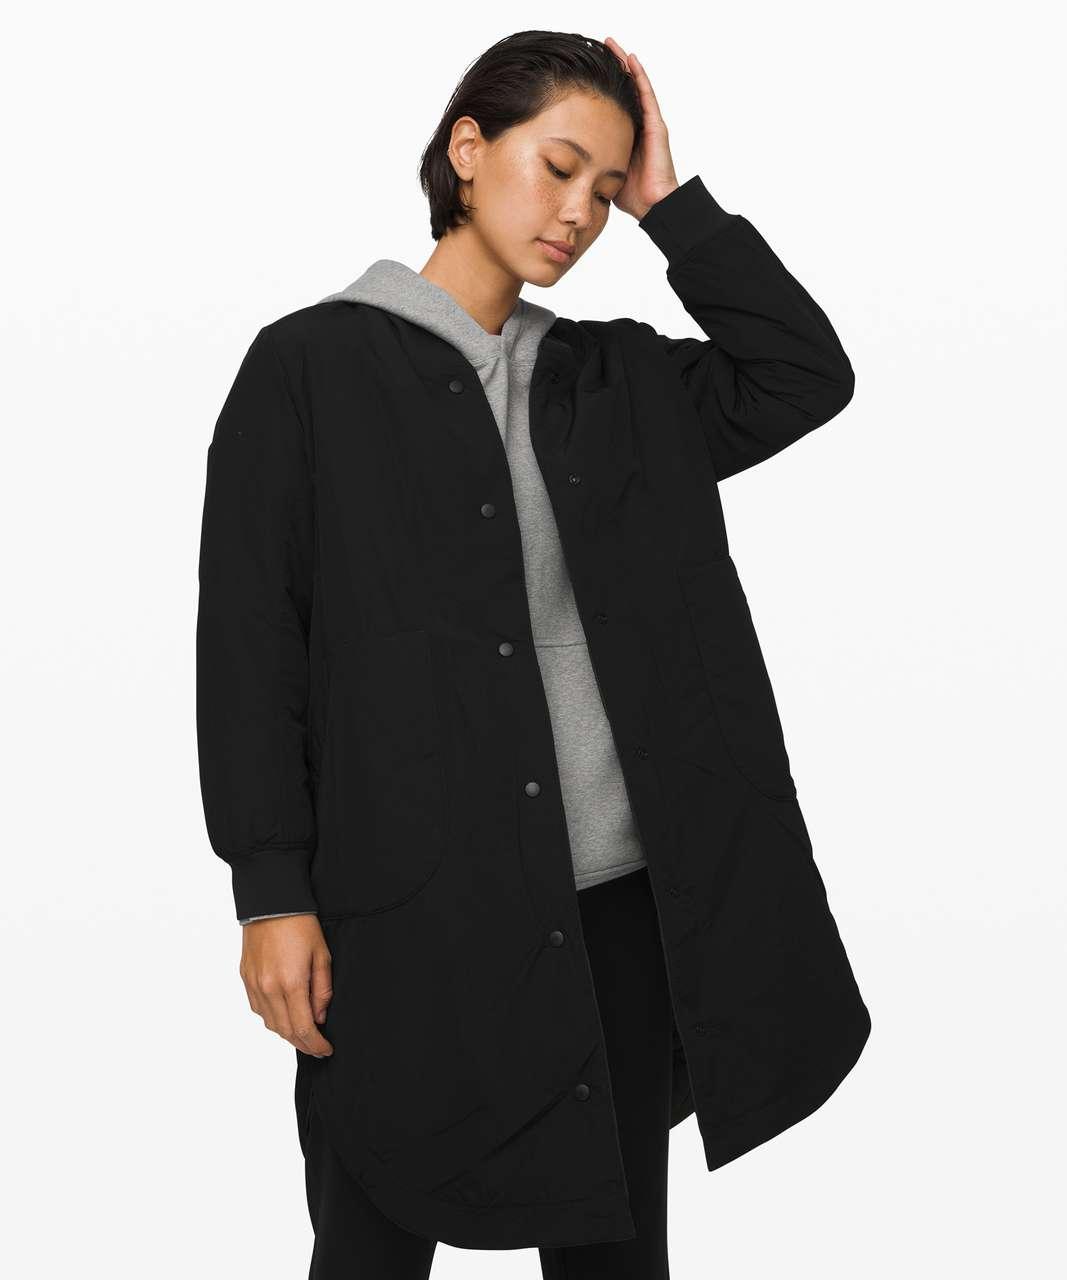 Lululemon Enough Puff Jacket - Dark Olive / Black